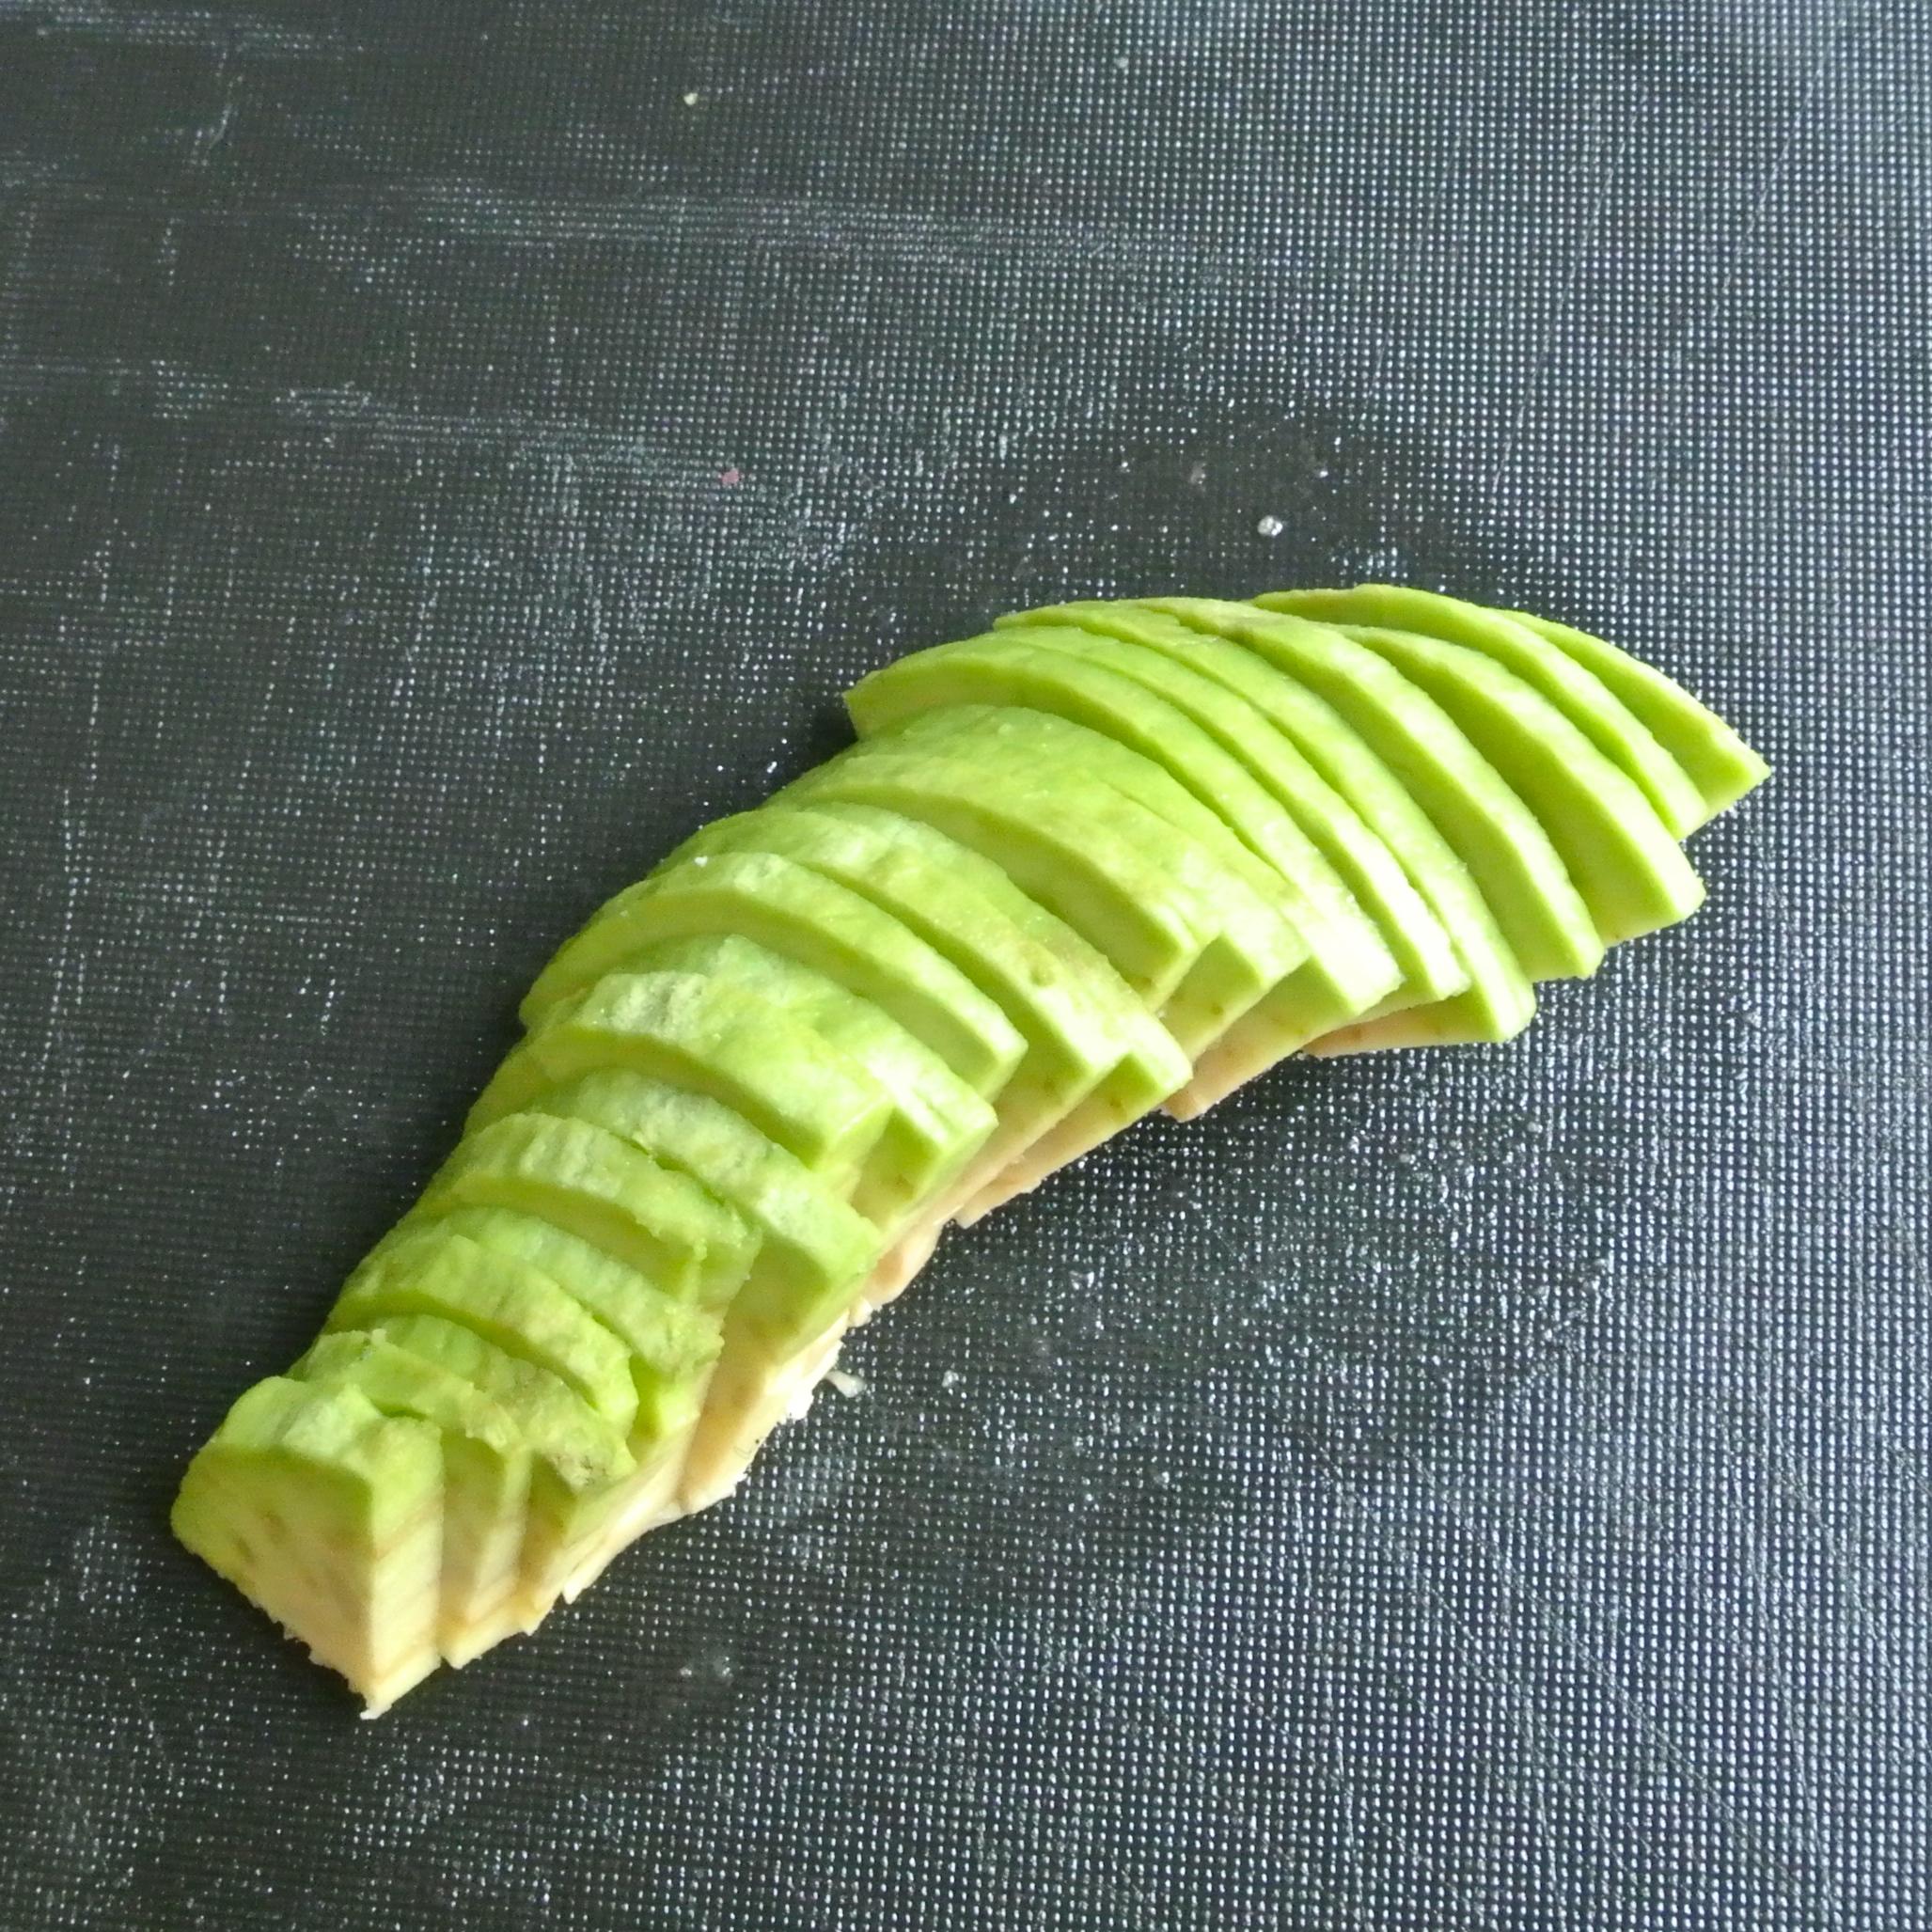 avocado_(C)LisaVockenhuber